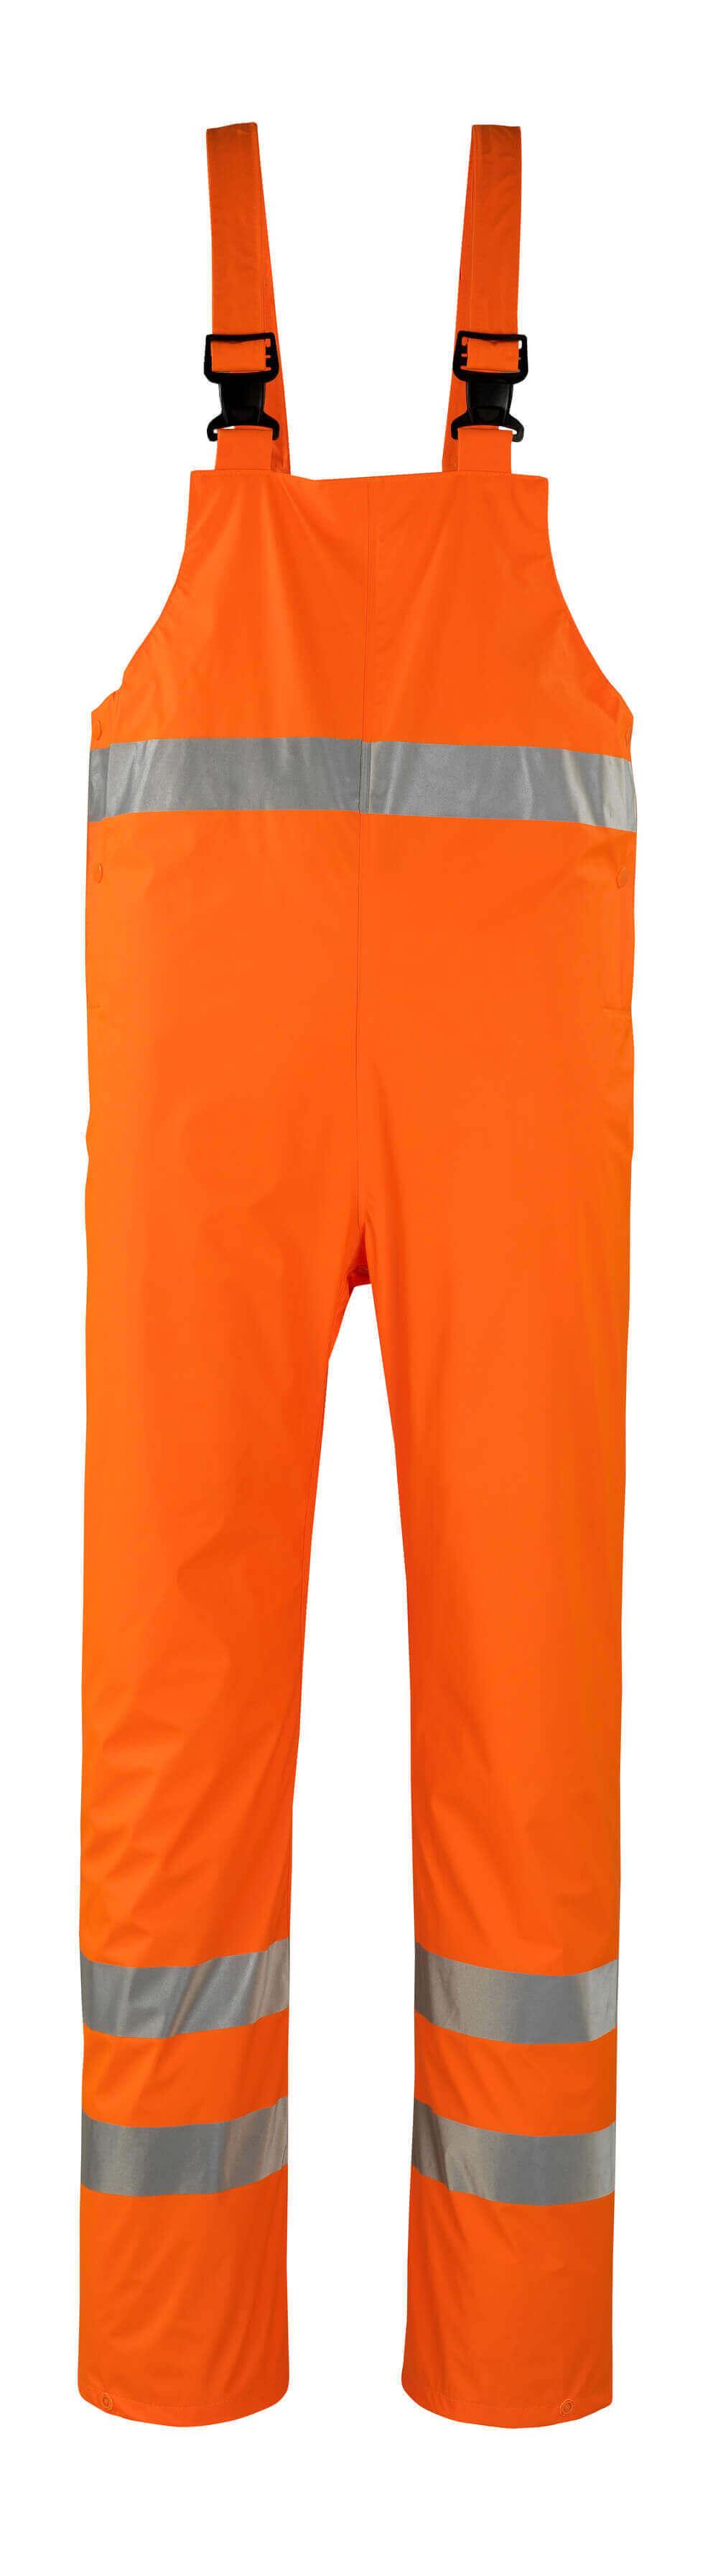 50103-814-14 Rain Bib & Brace - hi-vis orange